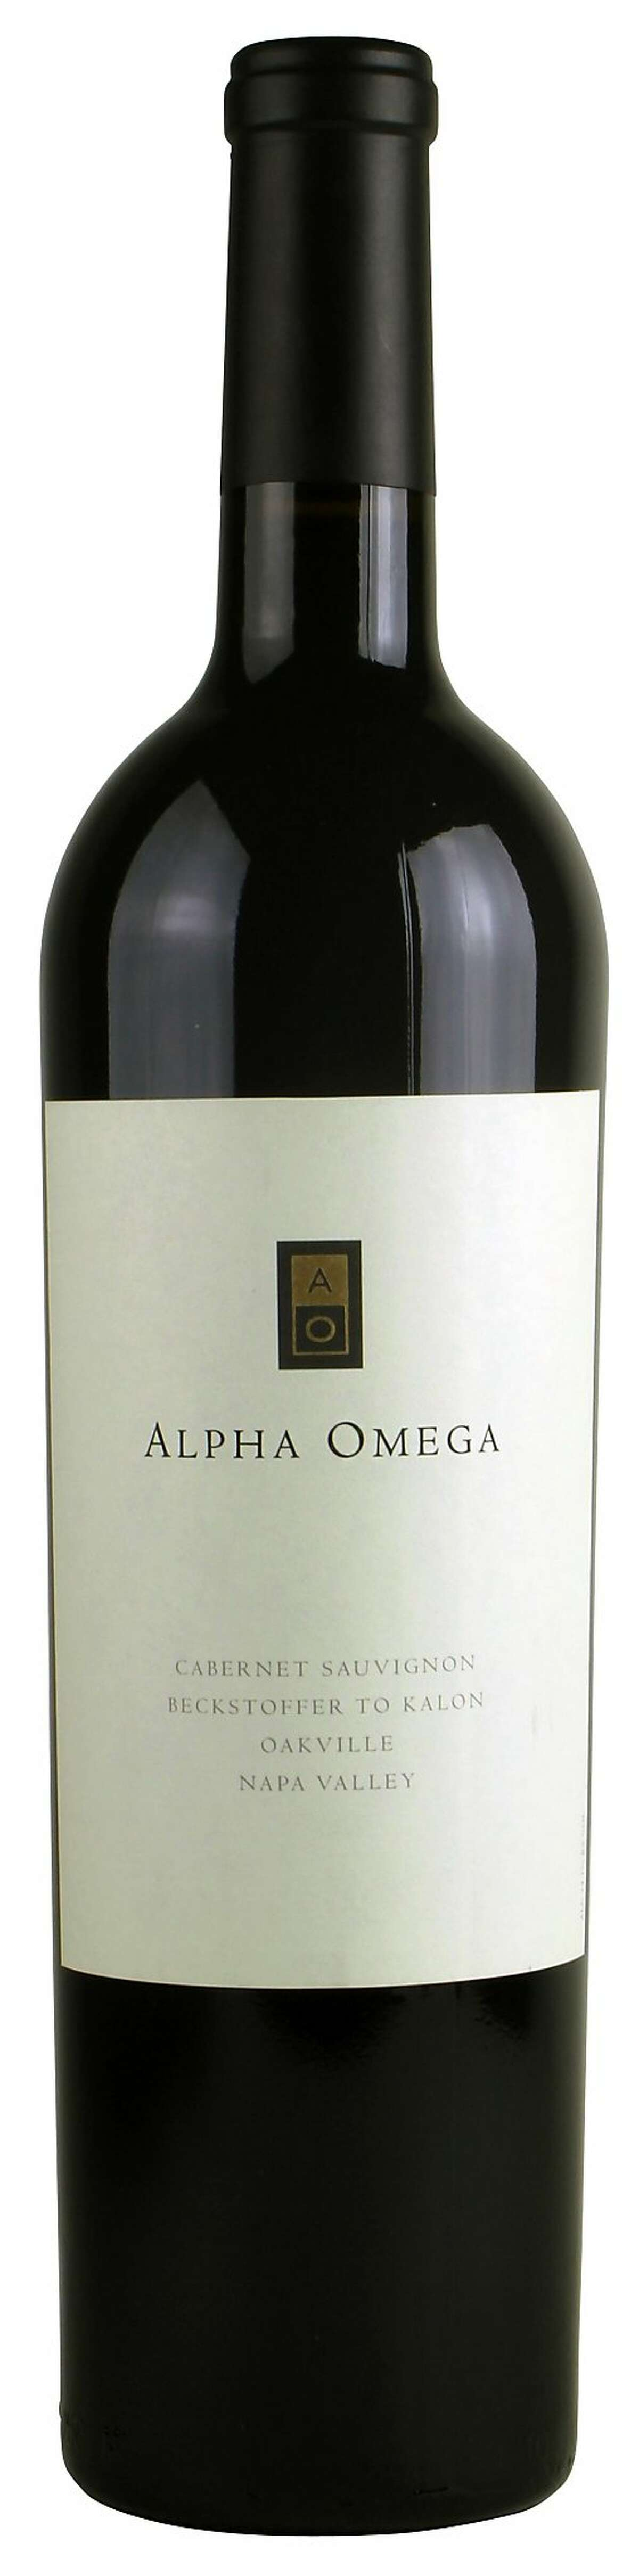 Alpha Omega Cabernet Sauvignon Oakville Beckstoffer To Kalon 2013 ($225, 14.5%)